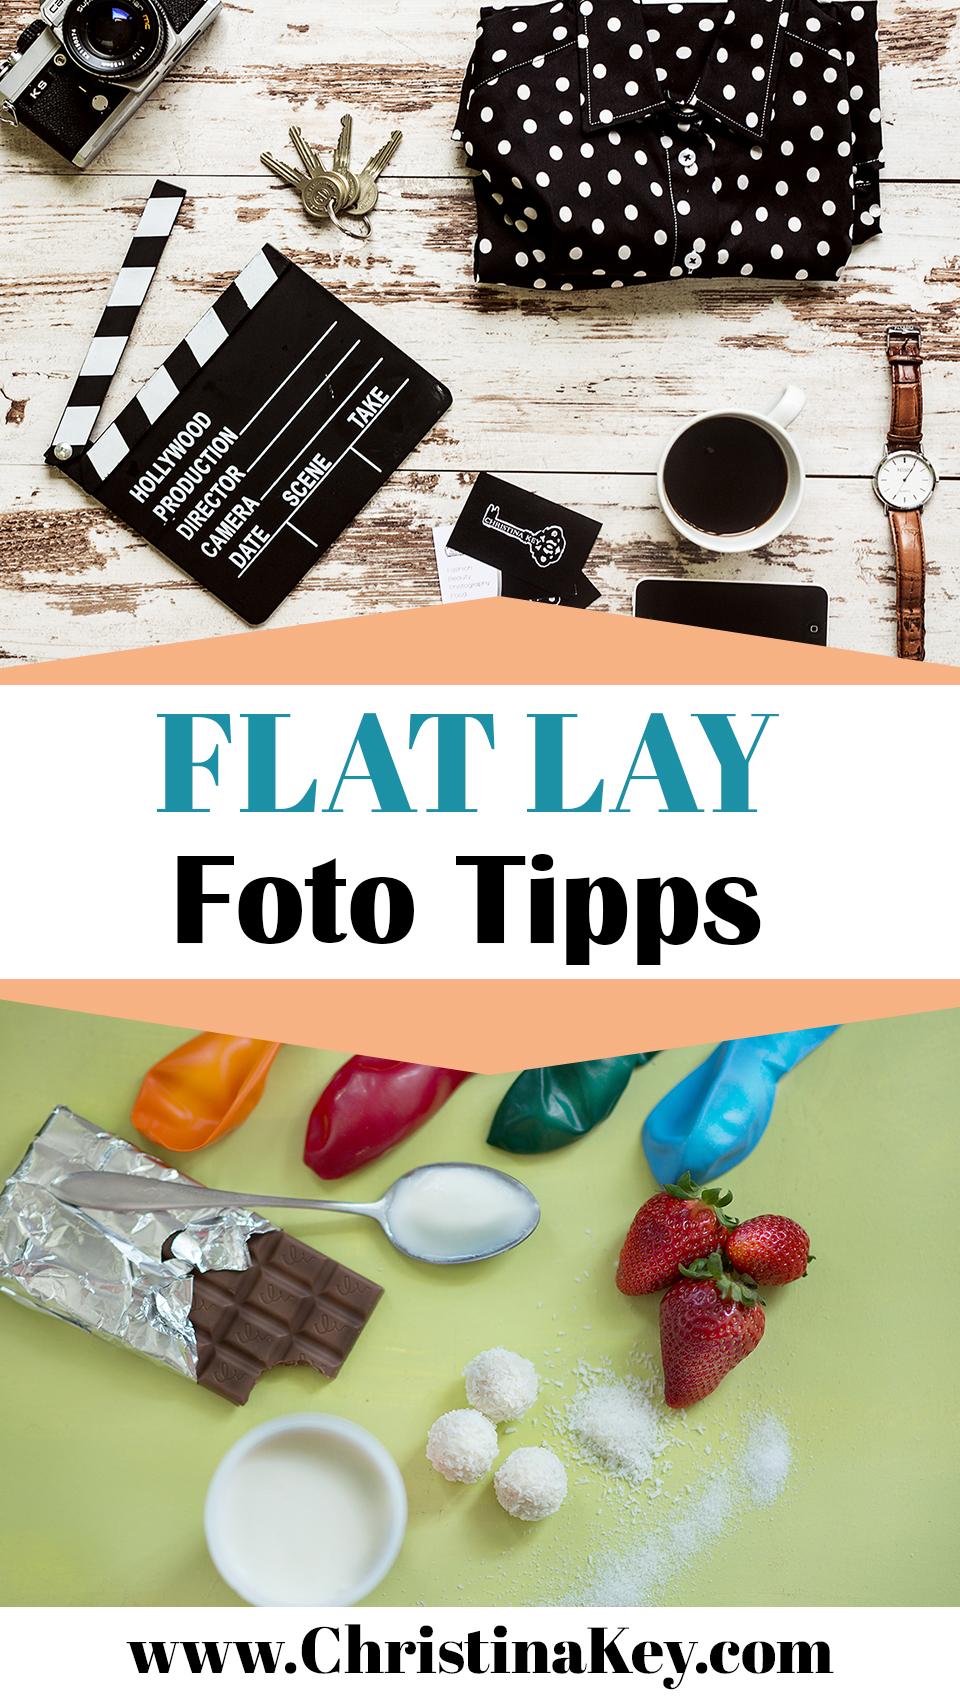 Flat Lay Tipps Fotografie